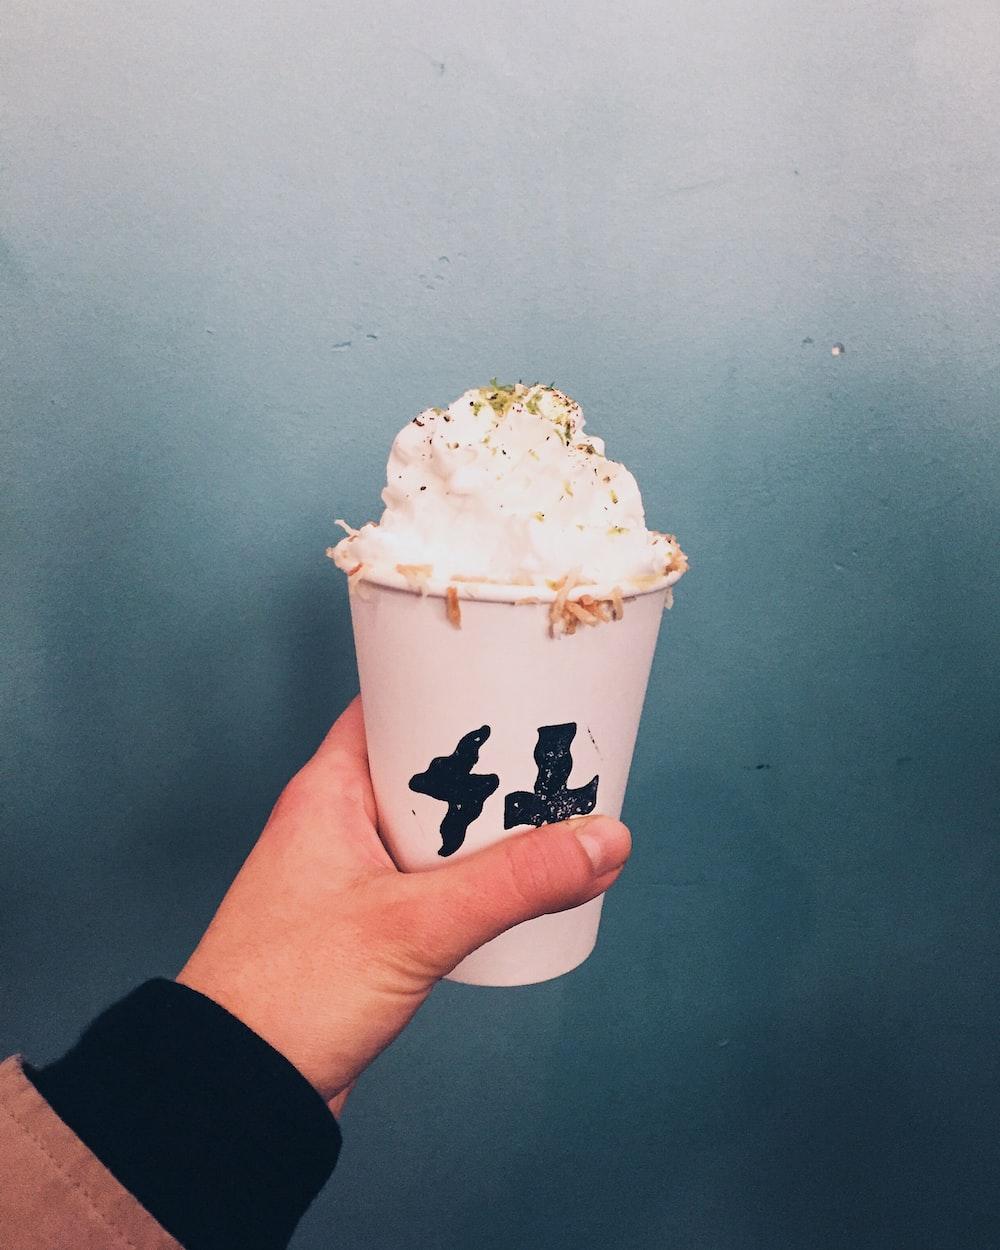 white ice cream on cup